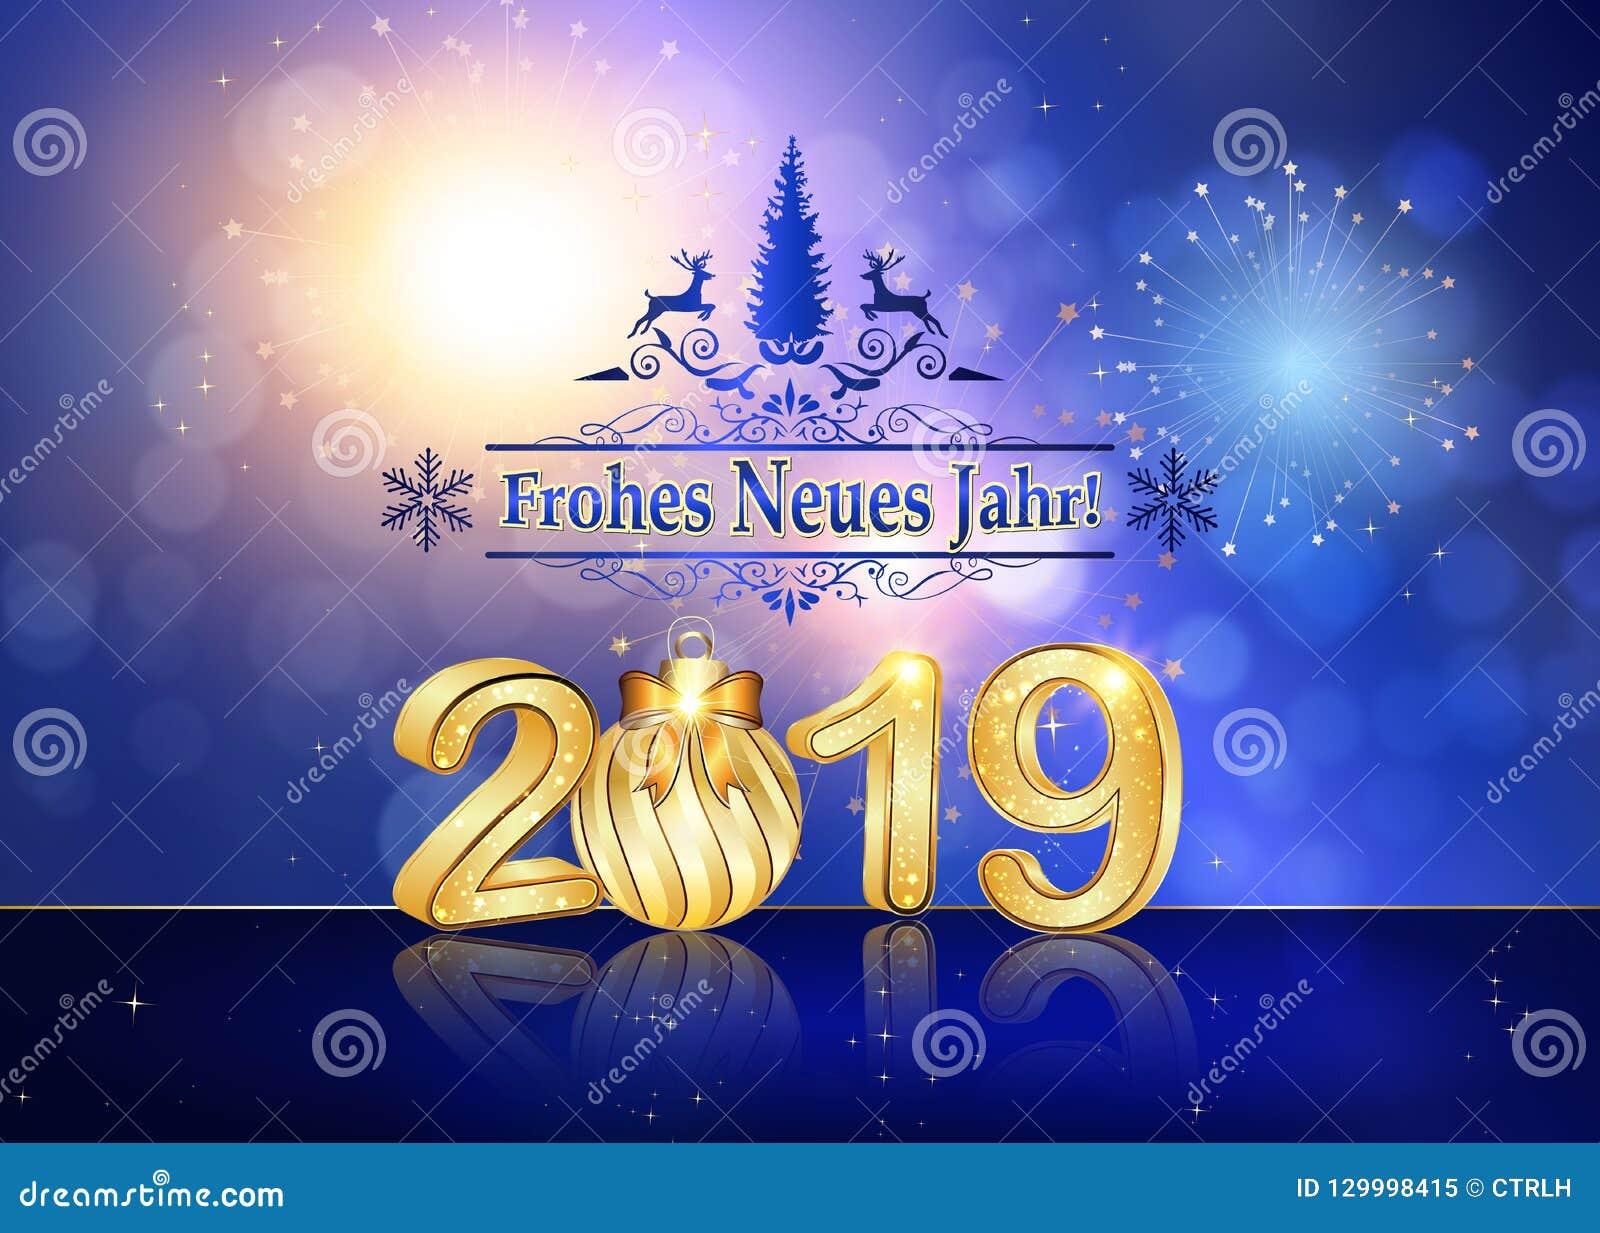 happy new year 2019 written in german seasons greeting card